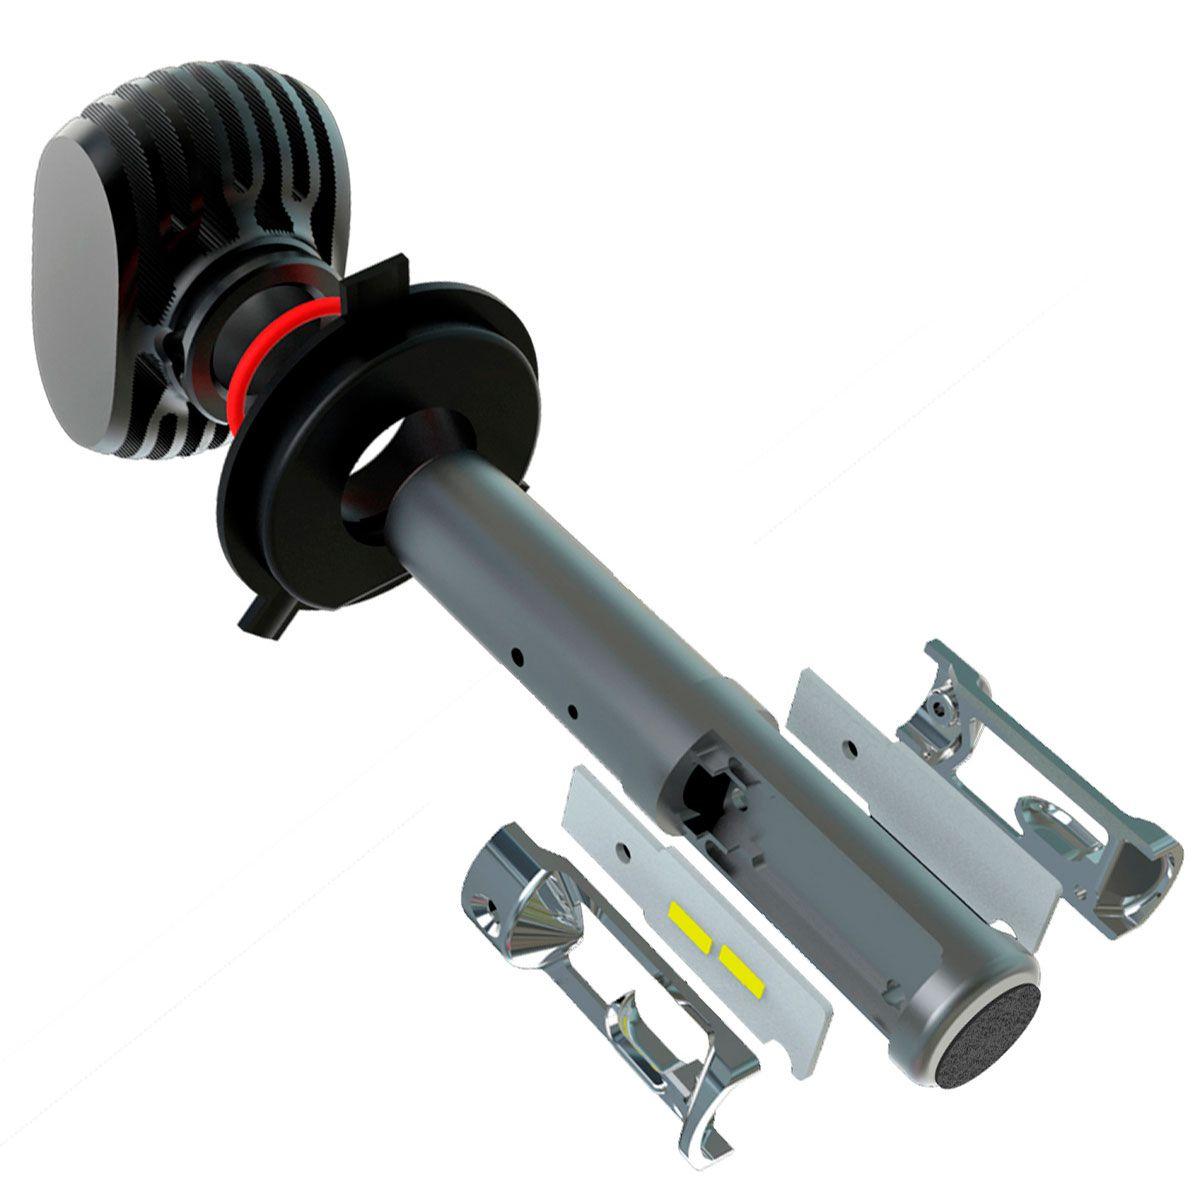 Kit Ultra LED Gol Bola 1995 1996 1997 1998 1999 2000 2001 2002 2003 tipo xenon farol alto e baixo H4 50W